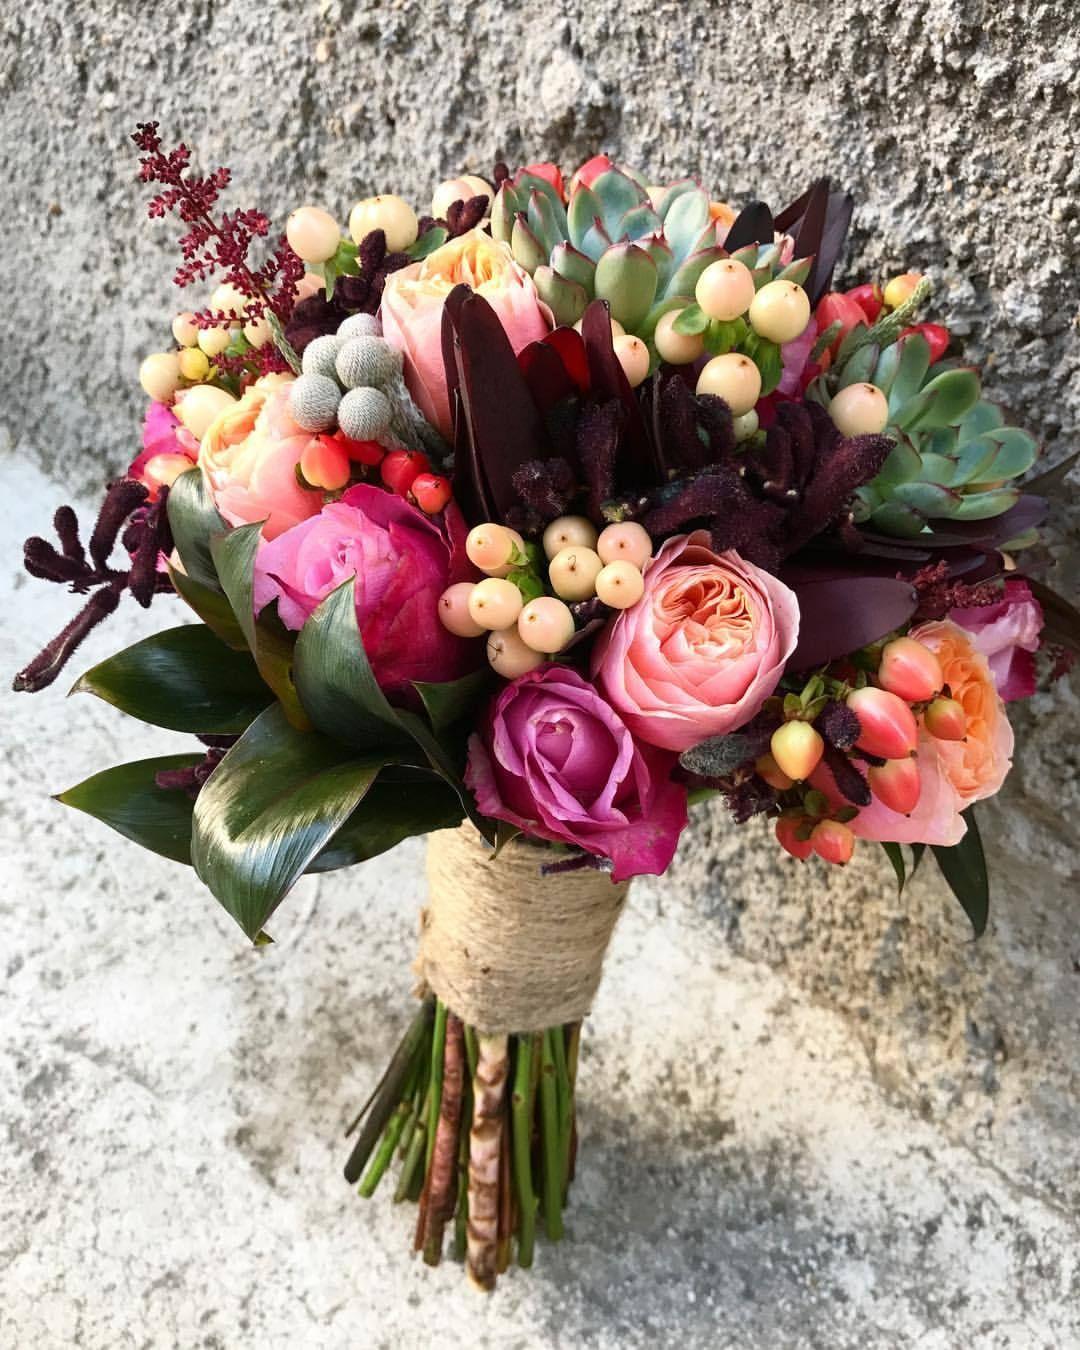 Renkli bir gün olsun! #queenandthegardener #underthefloralspell #floristsofinstagram #instaflorist #bridalgoals #gelinbuketi #ankaragelinbuketi (at Ankara, Turkey)...